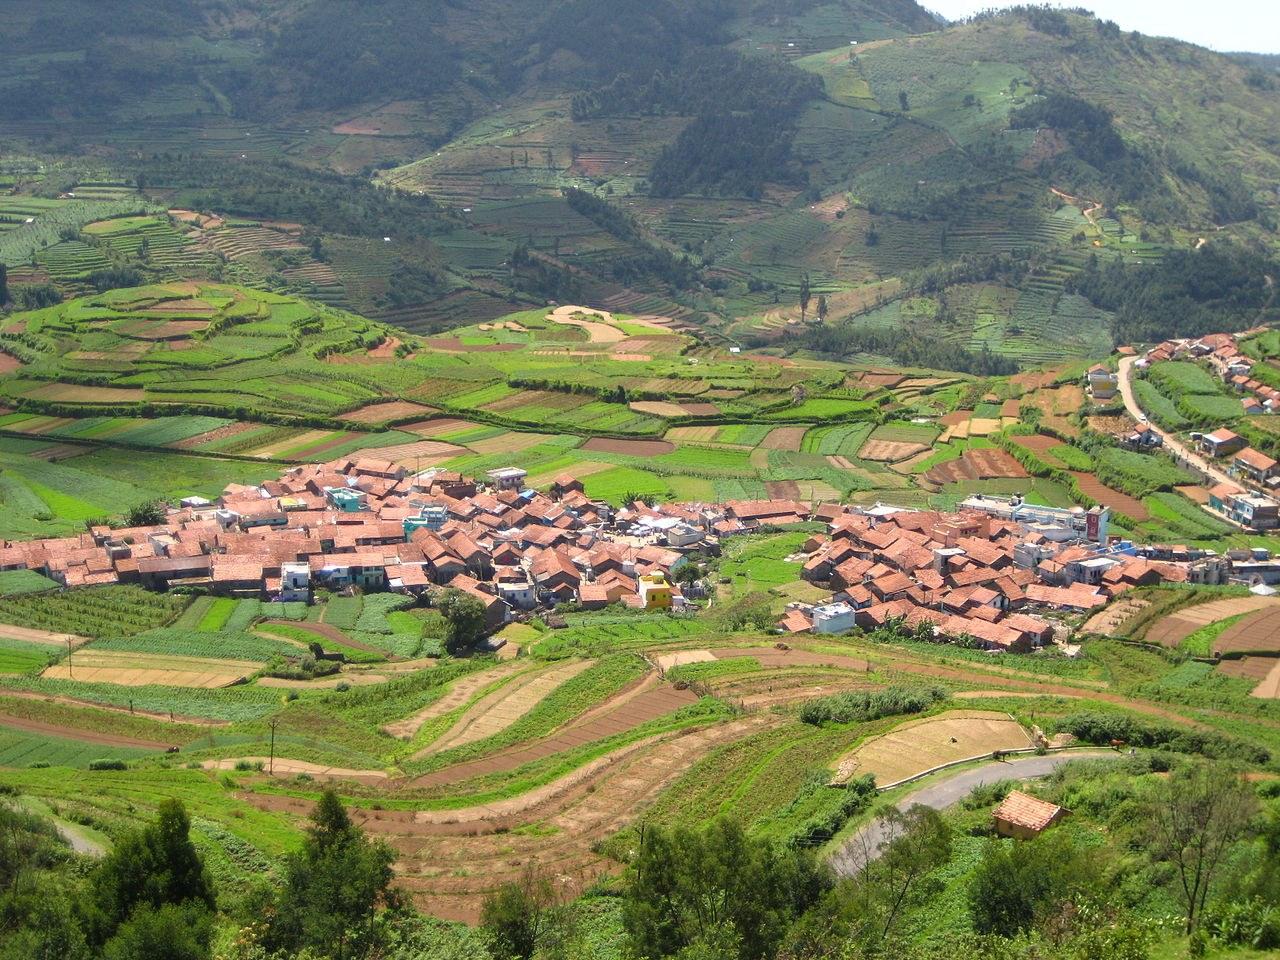 File:Poomparai village.jpg - Wikimedia Commons